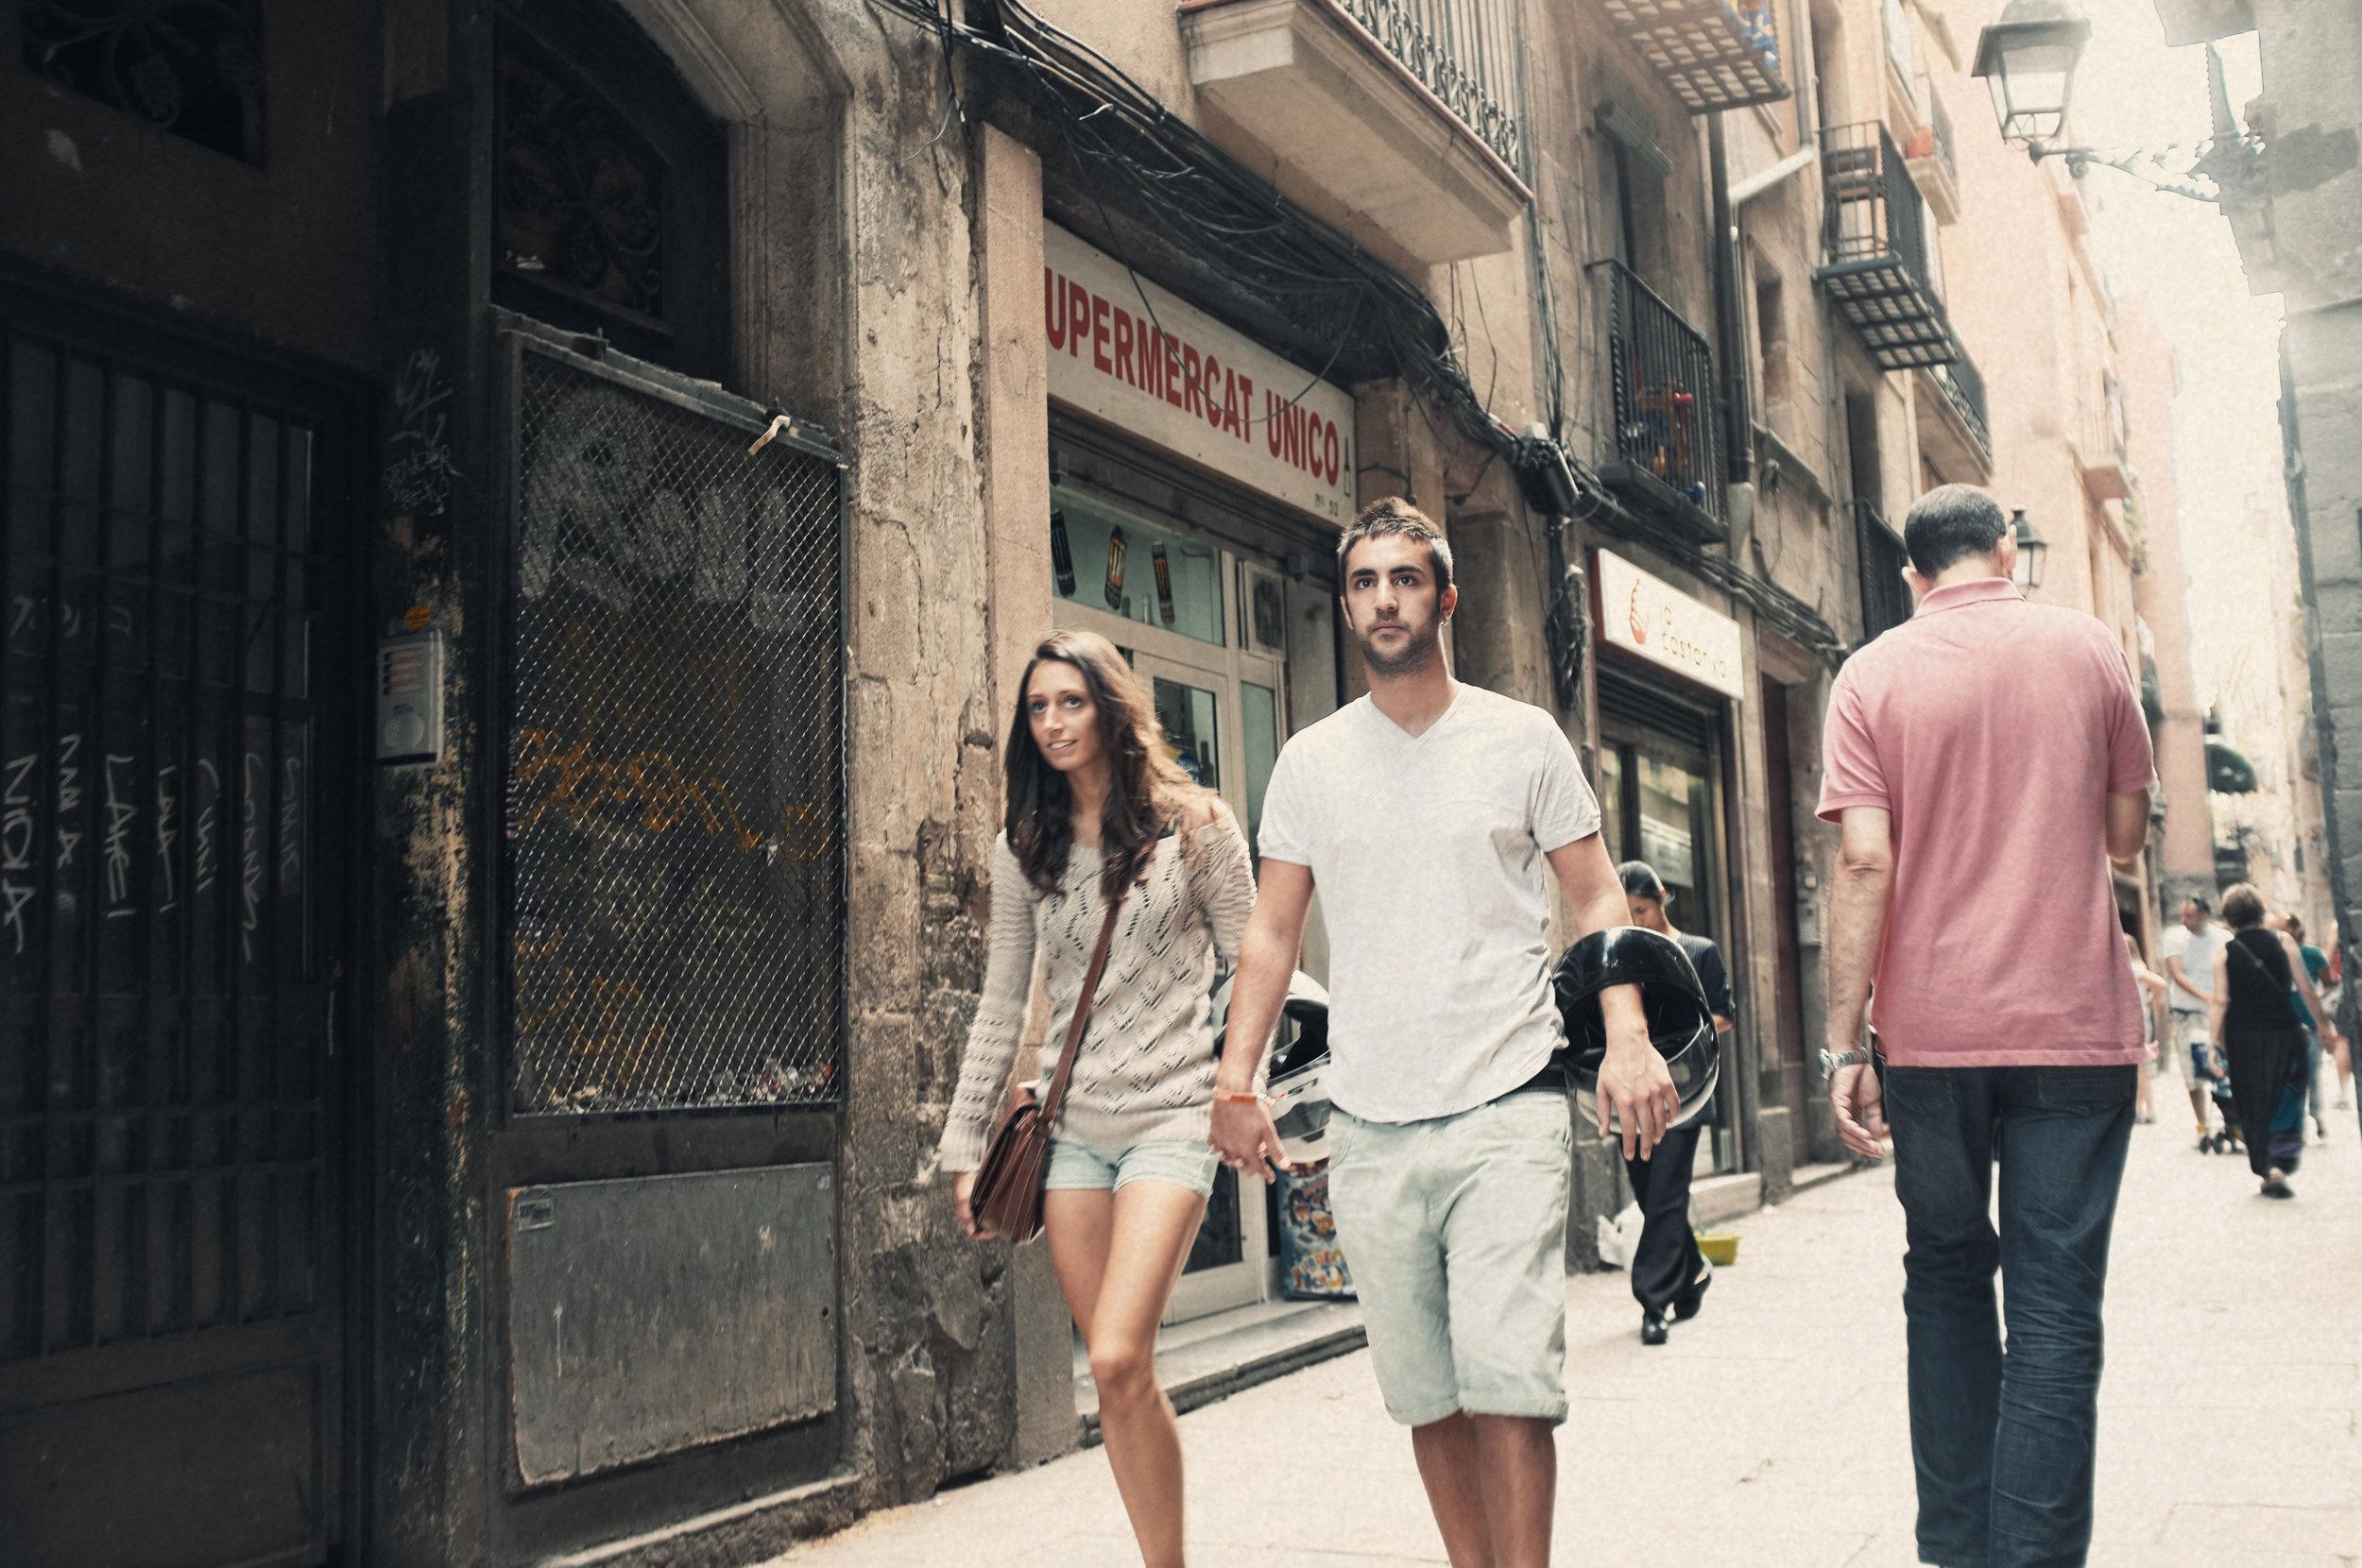 Barrio Gótico - De stad zónder toeristen